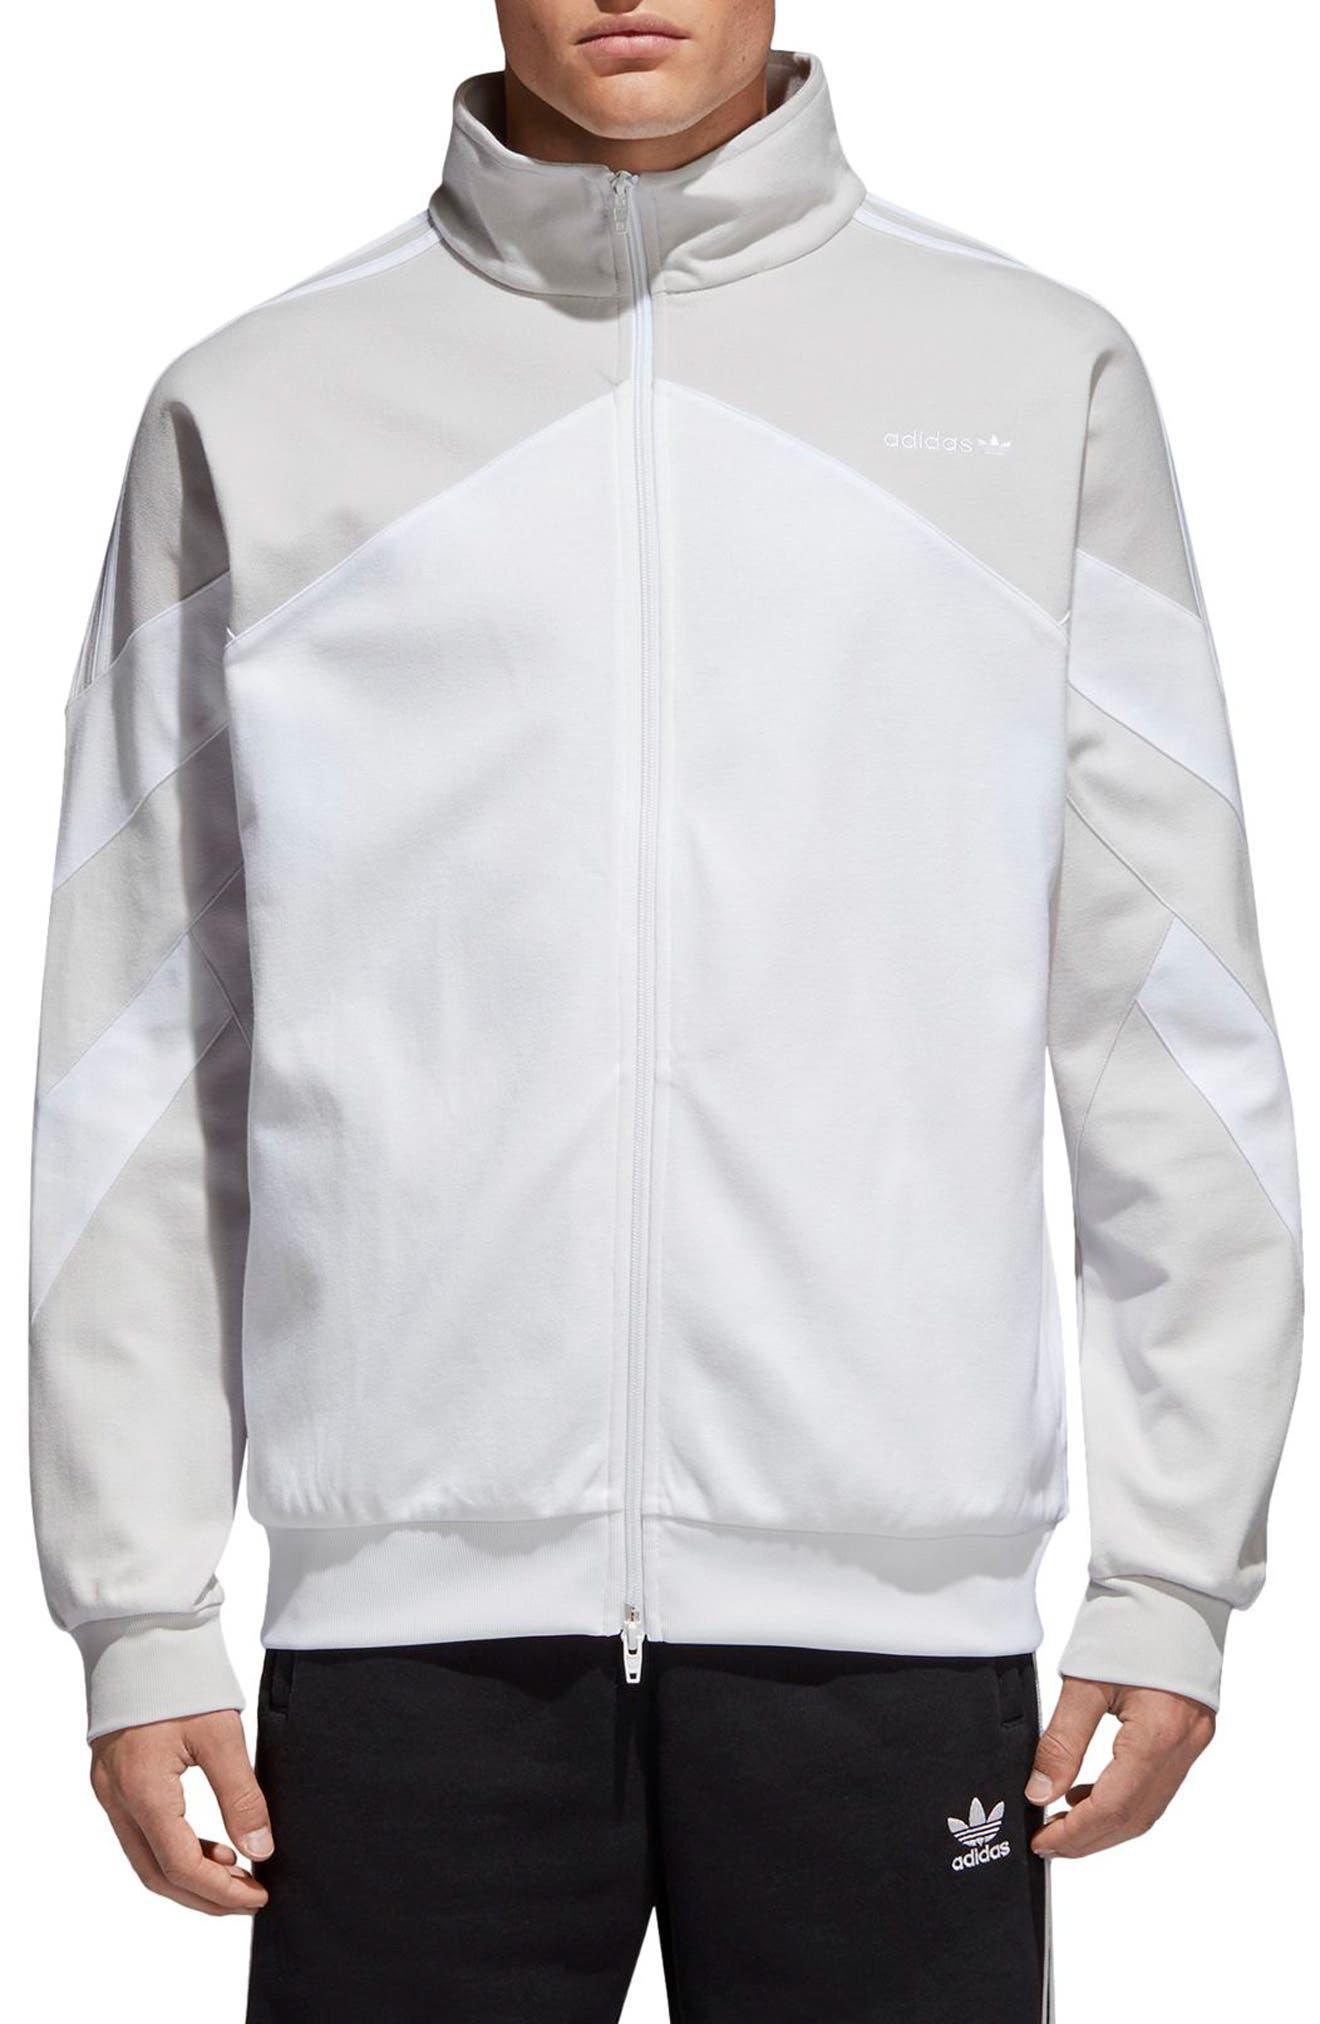 adidas Originals Palmeston Track Jacket